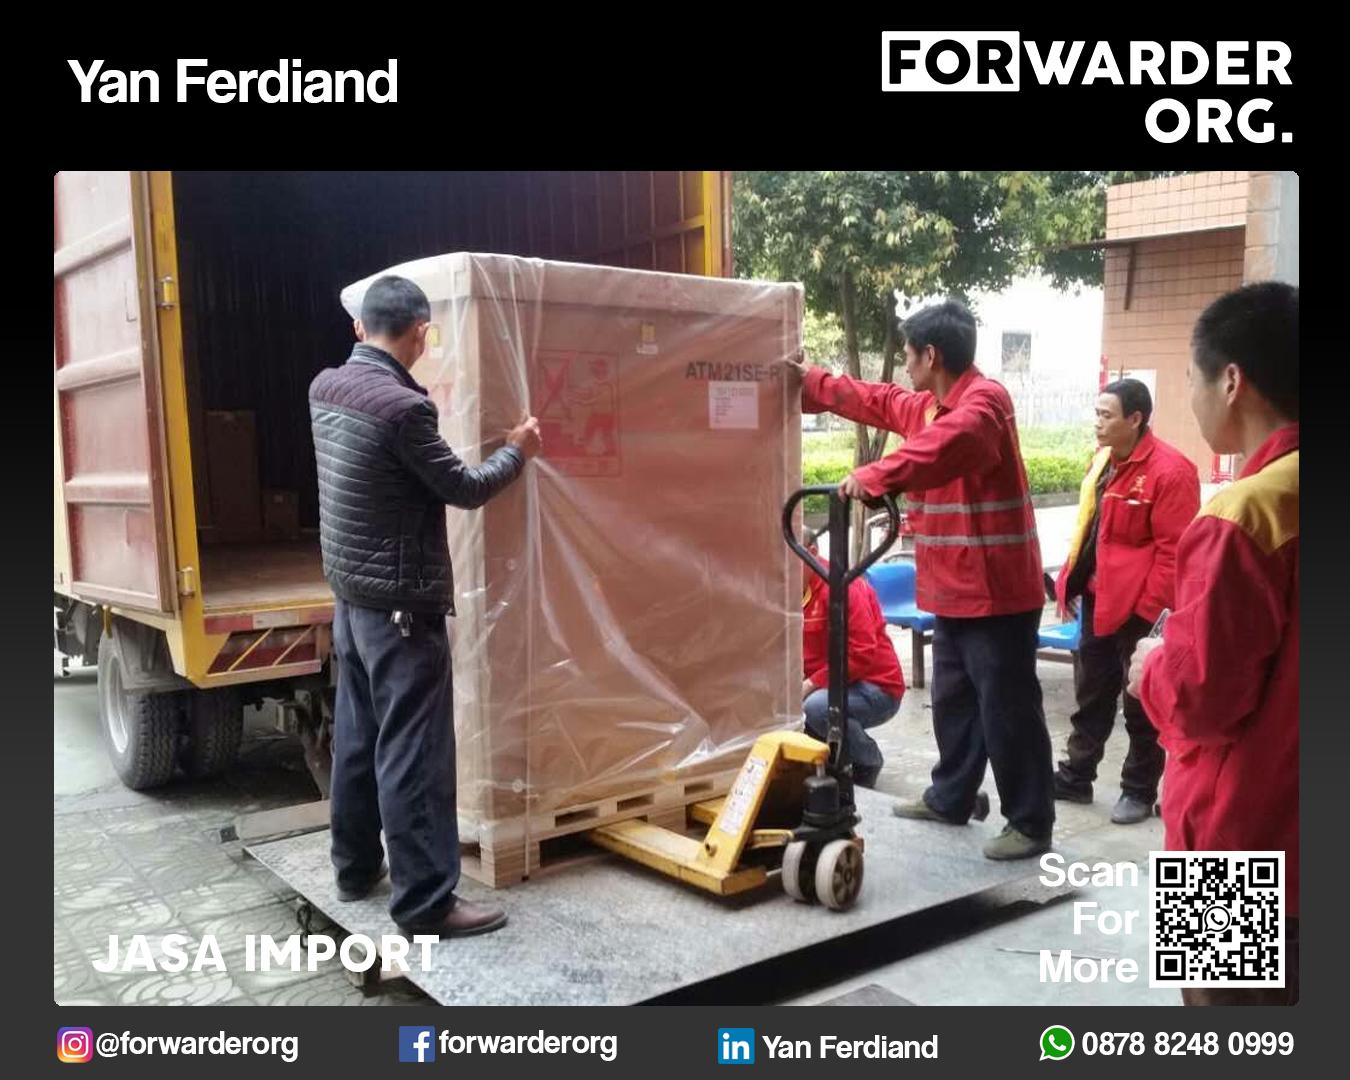 Jasa Import Barang Umum dan Lartas dari Eropa | FORWARDER ORG